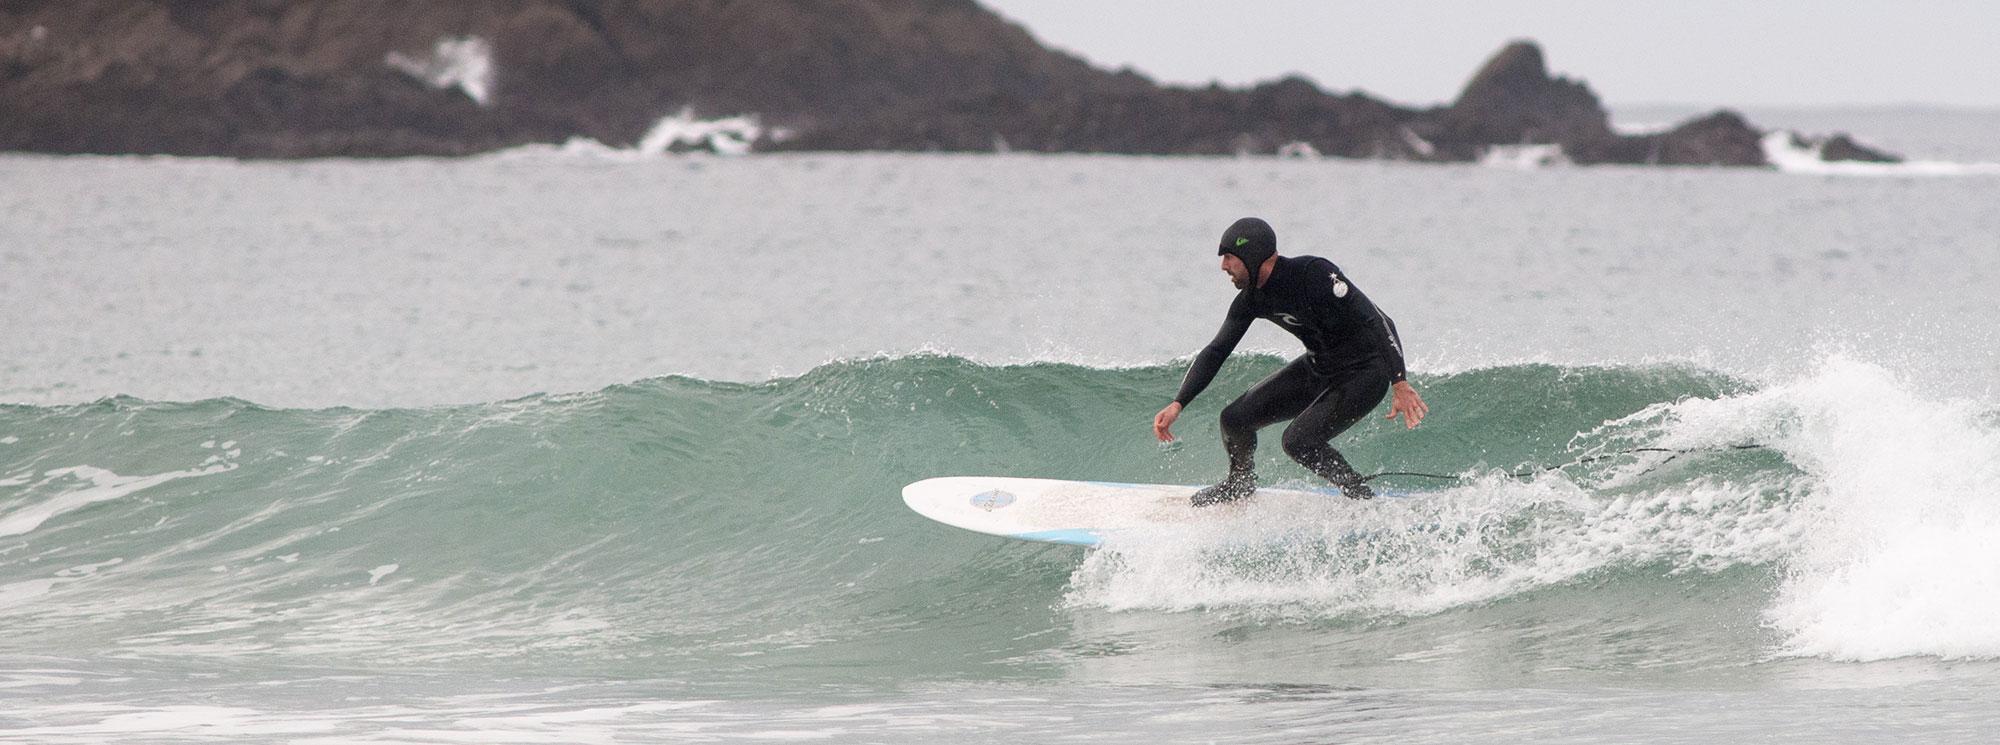 slide surftrip coco surf bretagne